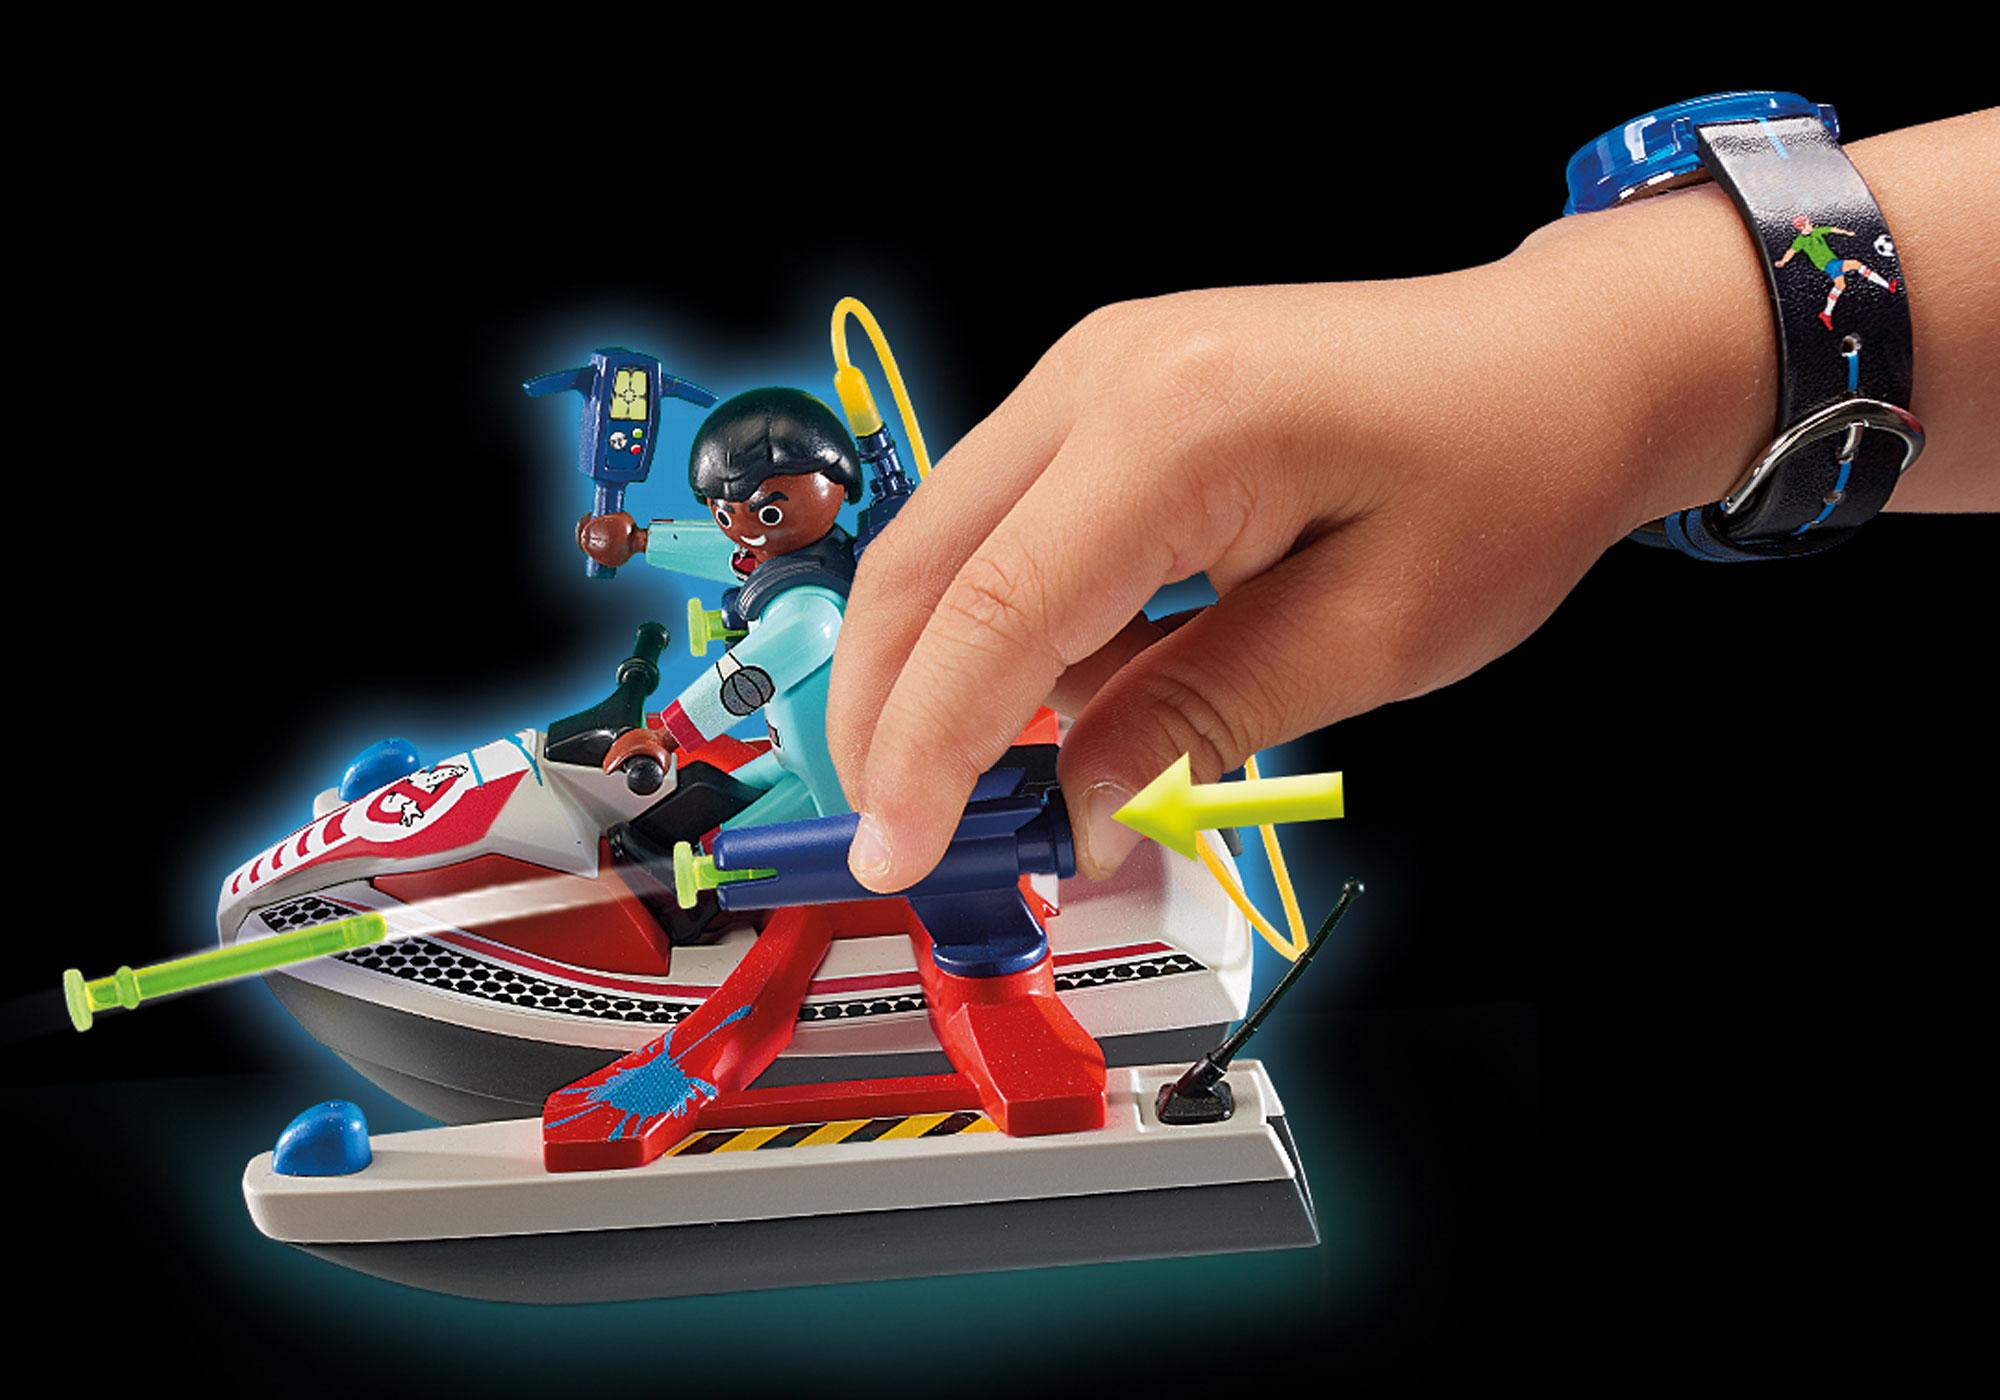 http://media.playmobil.com/i/playmobil/9387_product_extra1/Zeddemore med vandscooter